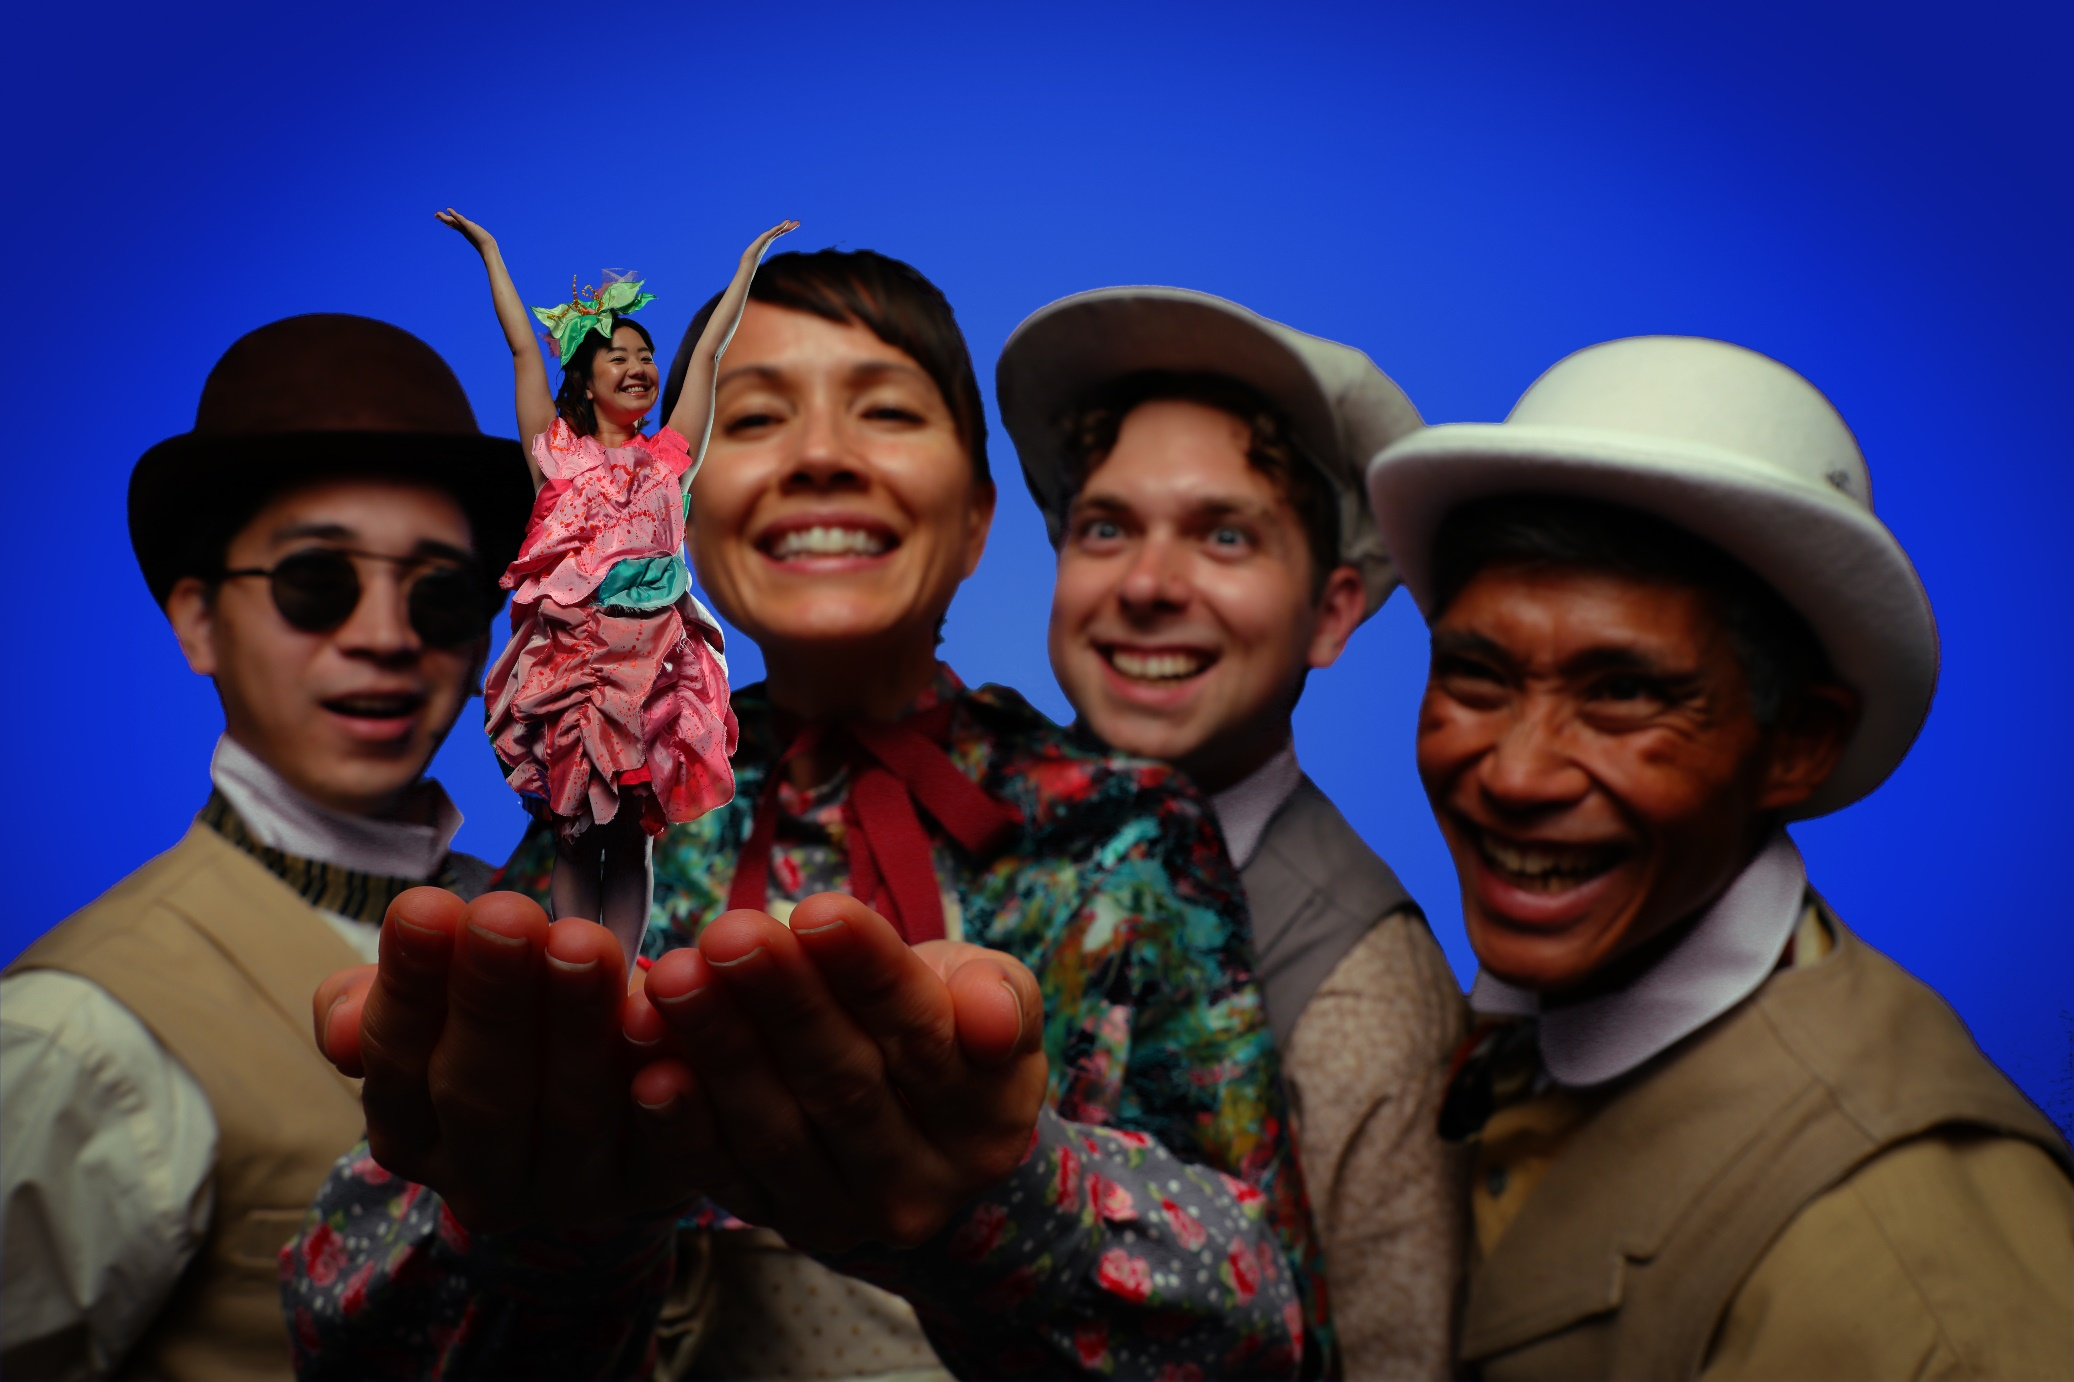 The cast of HTY's  Thumbelina  (l-r): Sean-Joseph Choo, Christine Uyeno, Maile Holck, Nathaniel Niemi, and Junior Tesoro. PC: Brad Goda